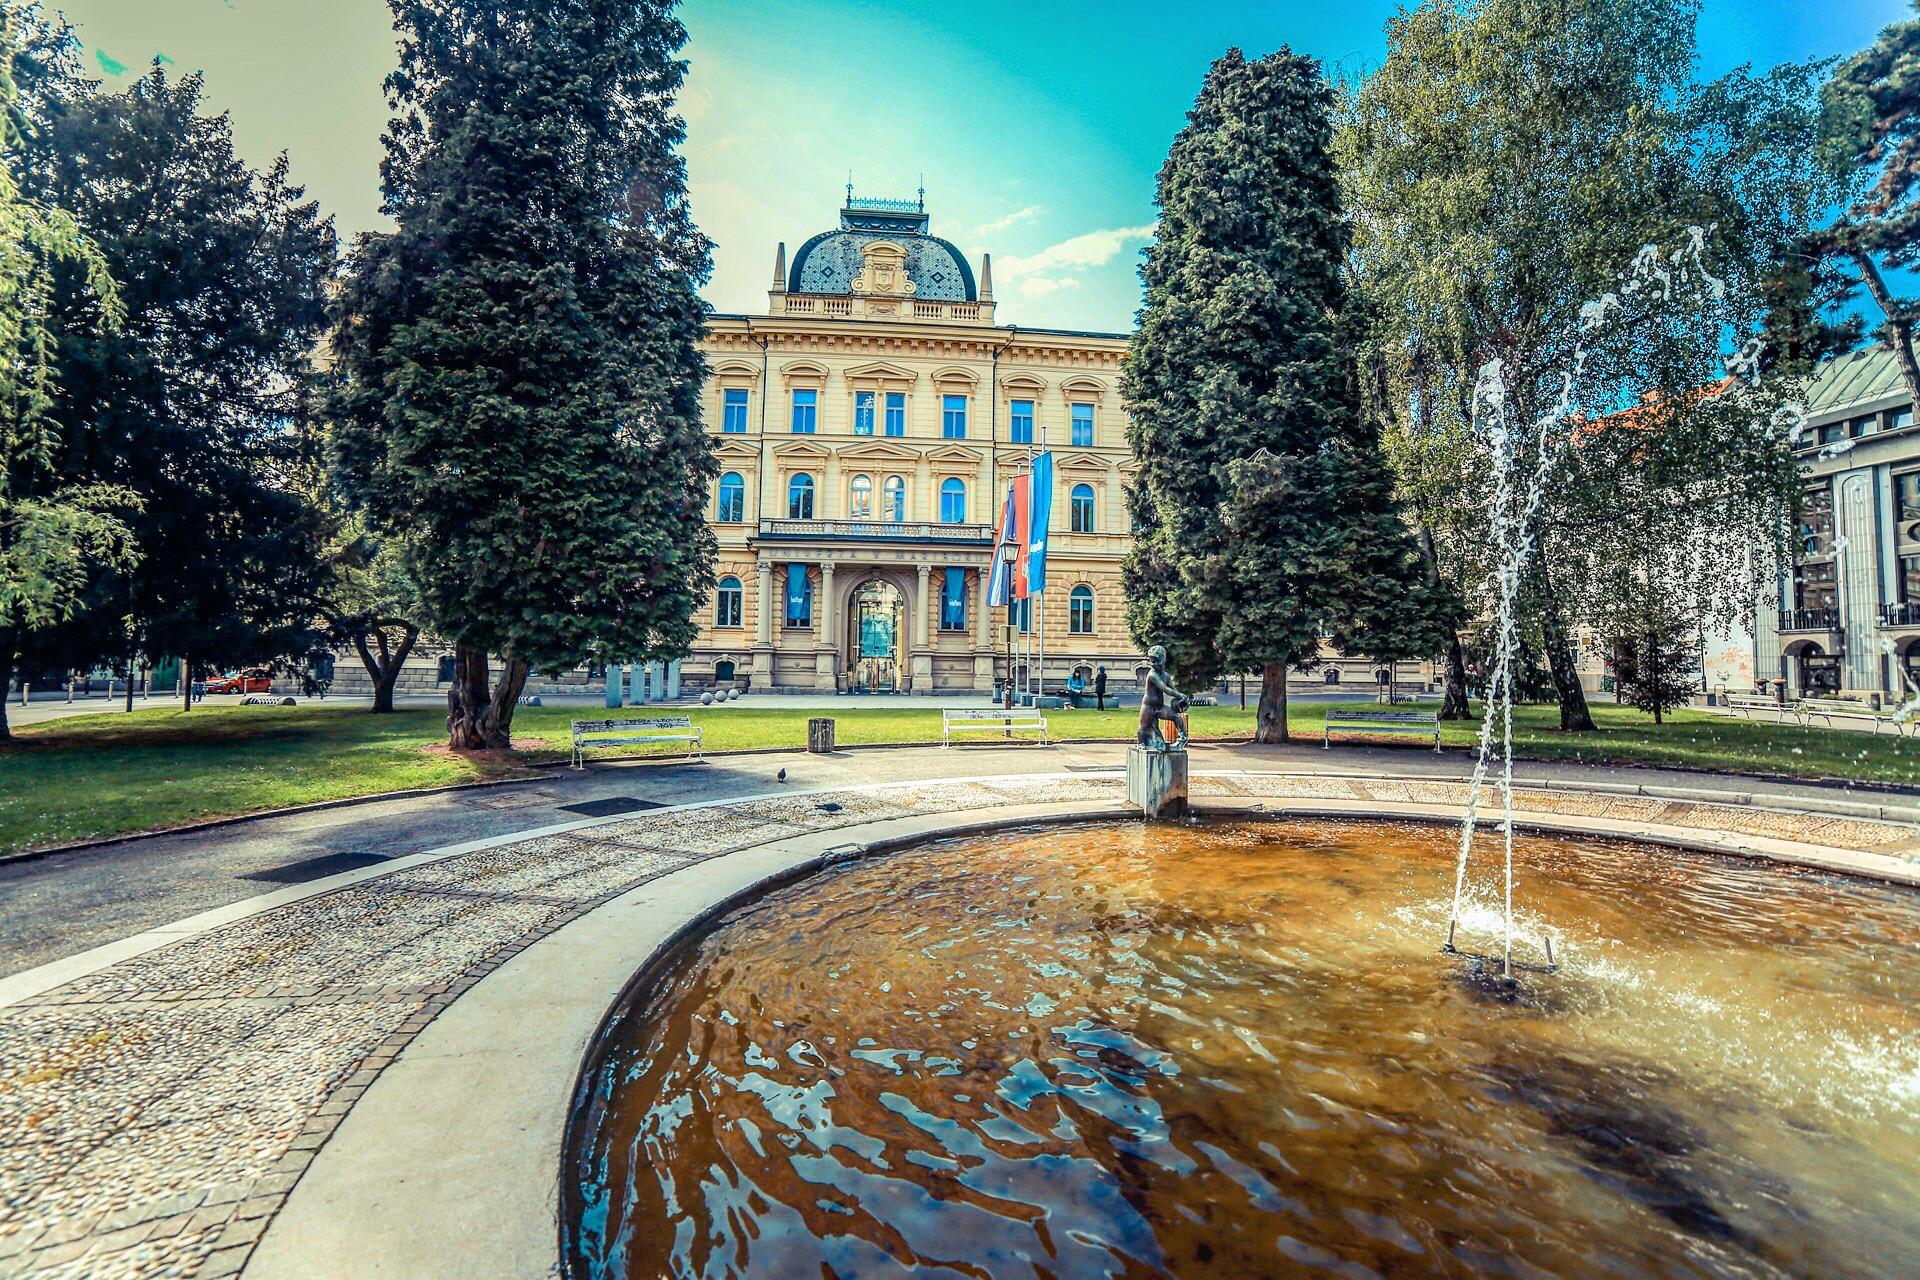 Pomladni_Maribor-11.jpg